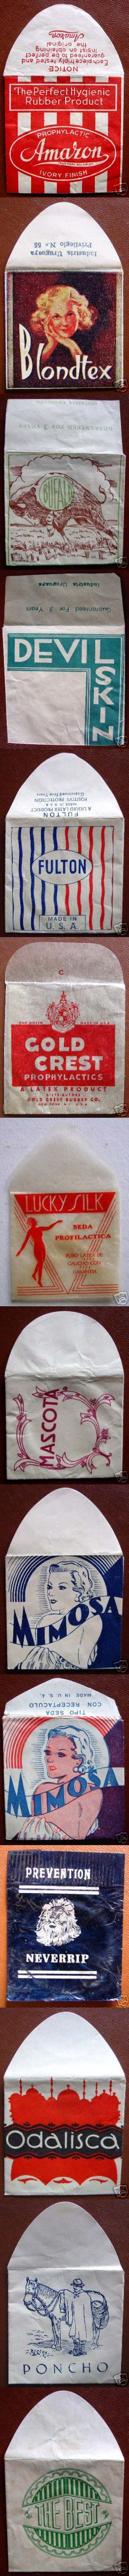 Vintage Comdoms